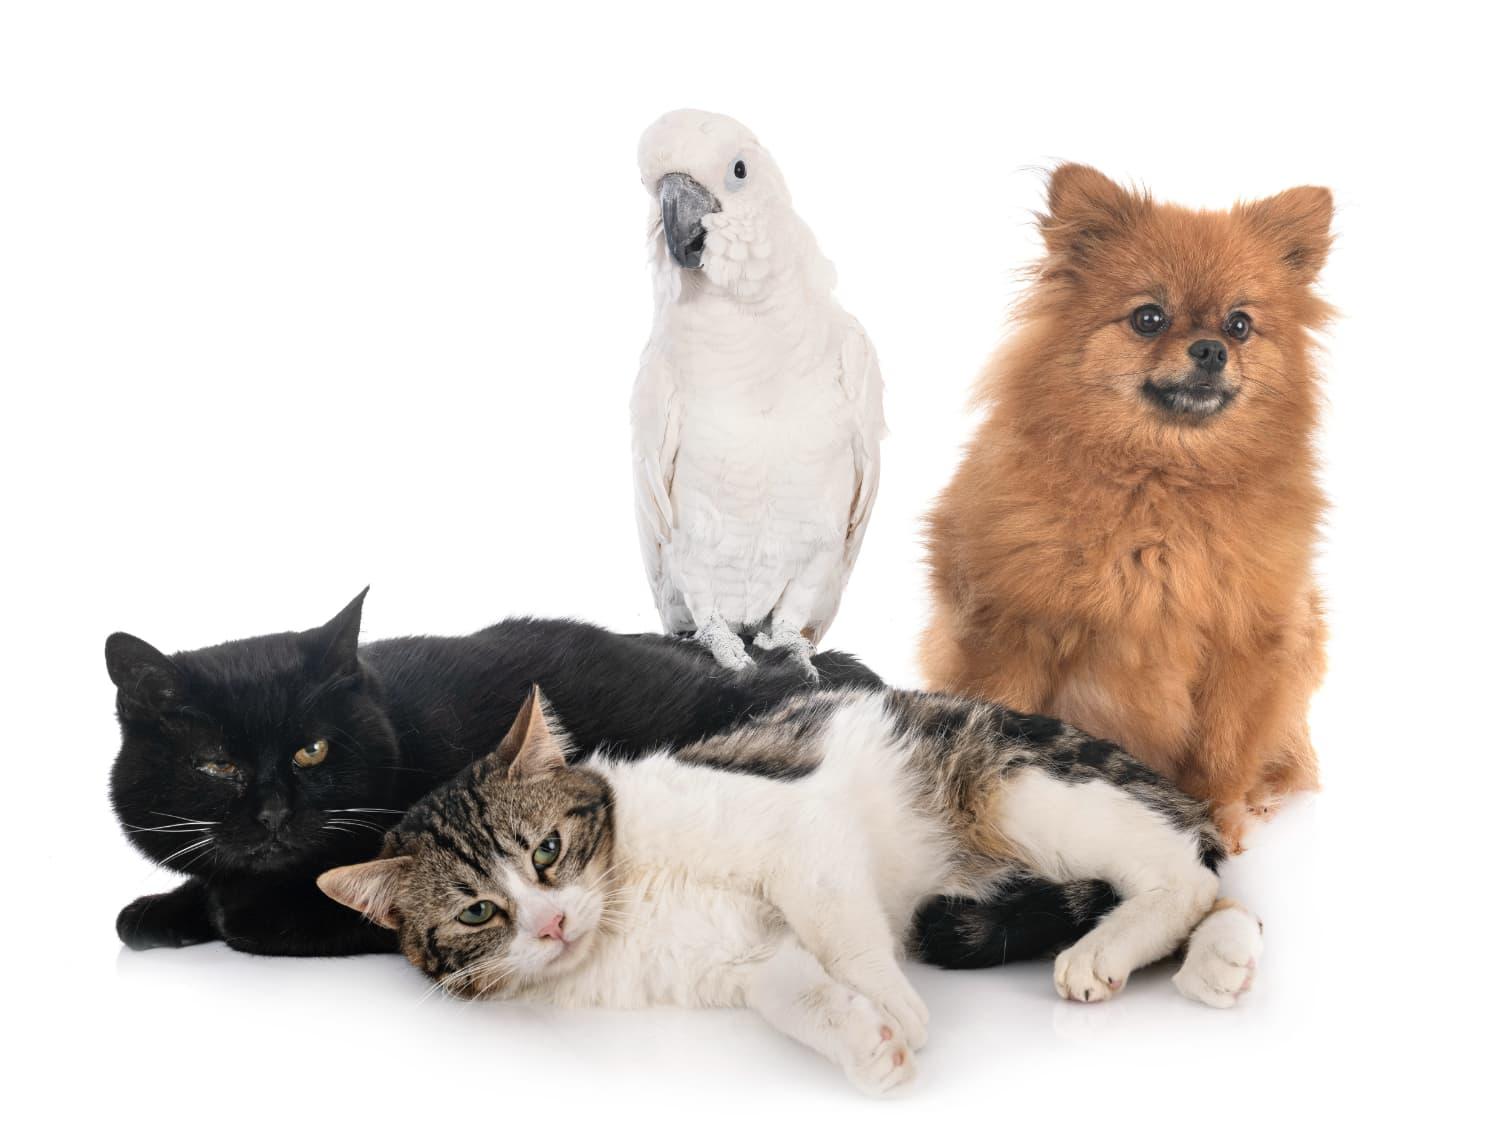 stray cats spitz and cockatoo BFK6ZDK@2x